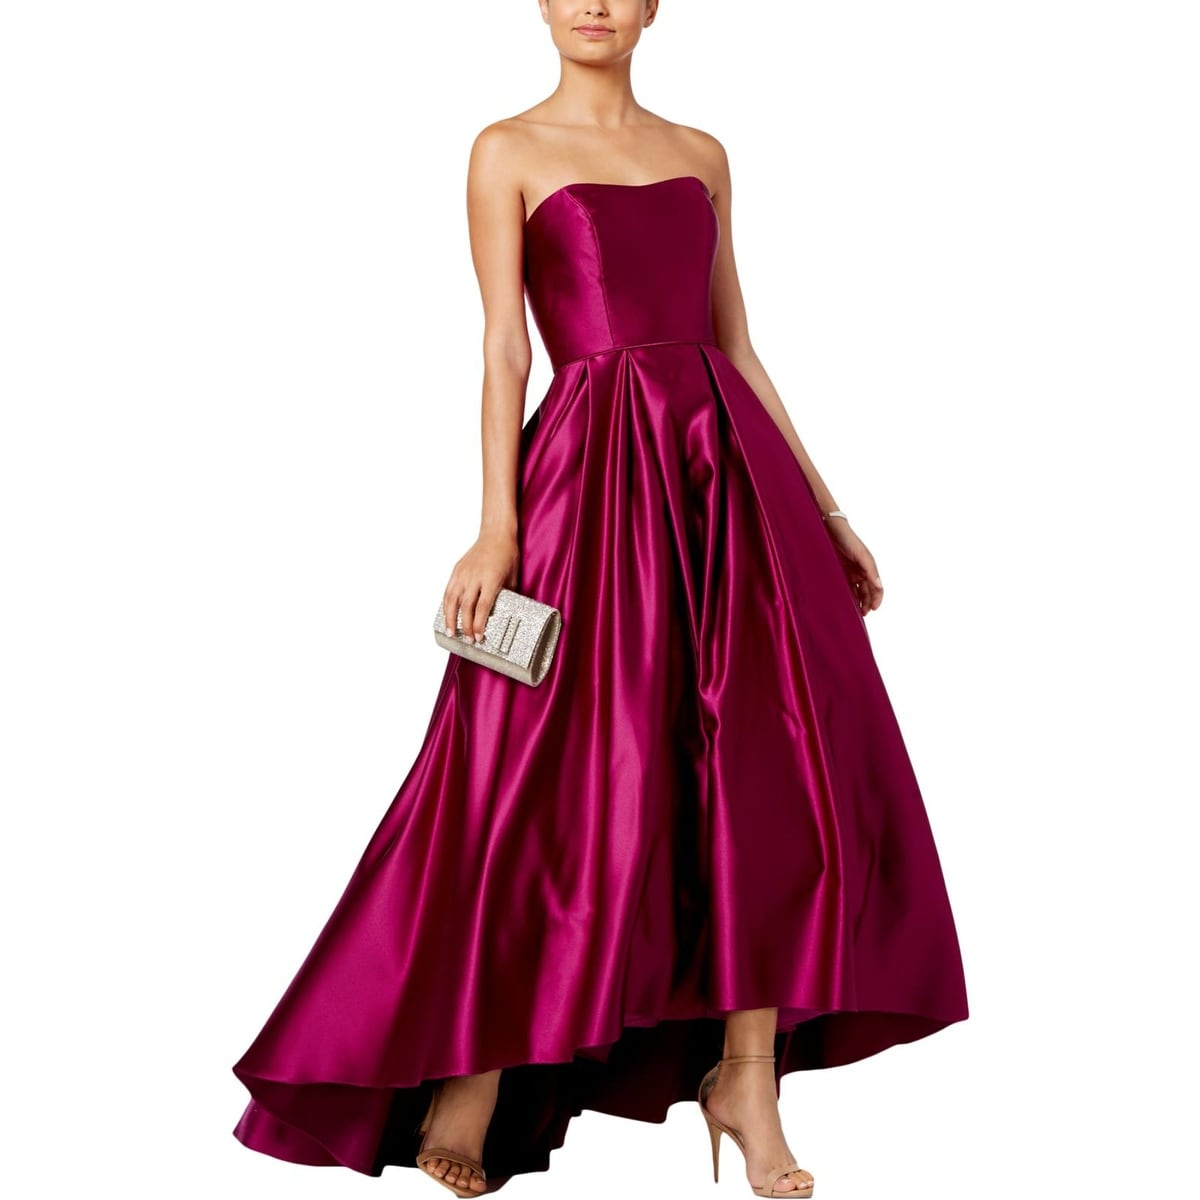 d7fb60af211 Shop Betsy   Adam Womens Evening Dress Hi-Low Strapless - Free ...